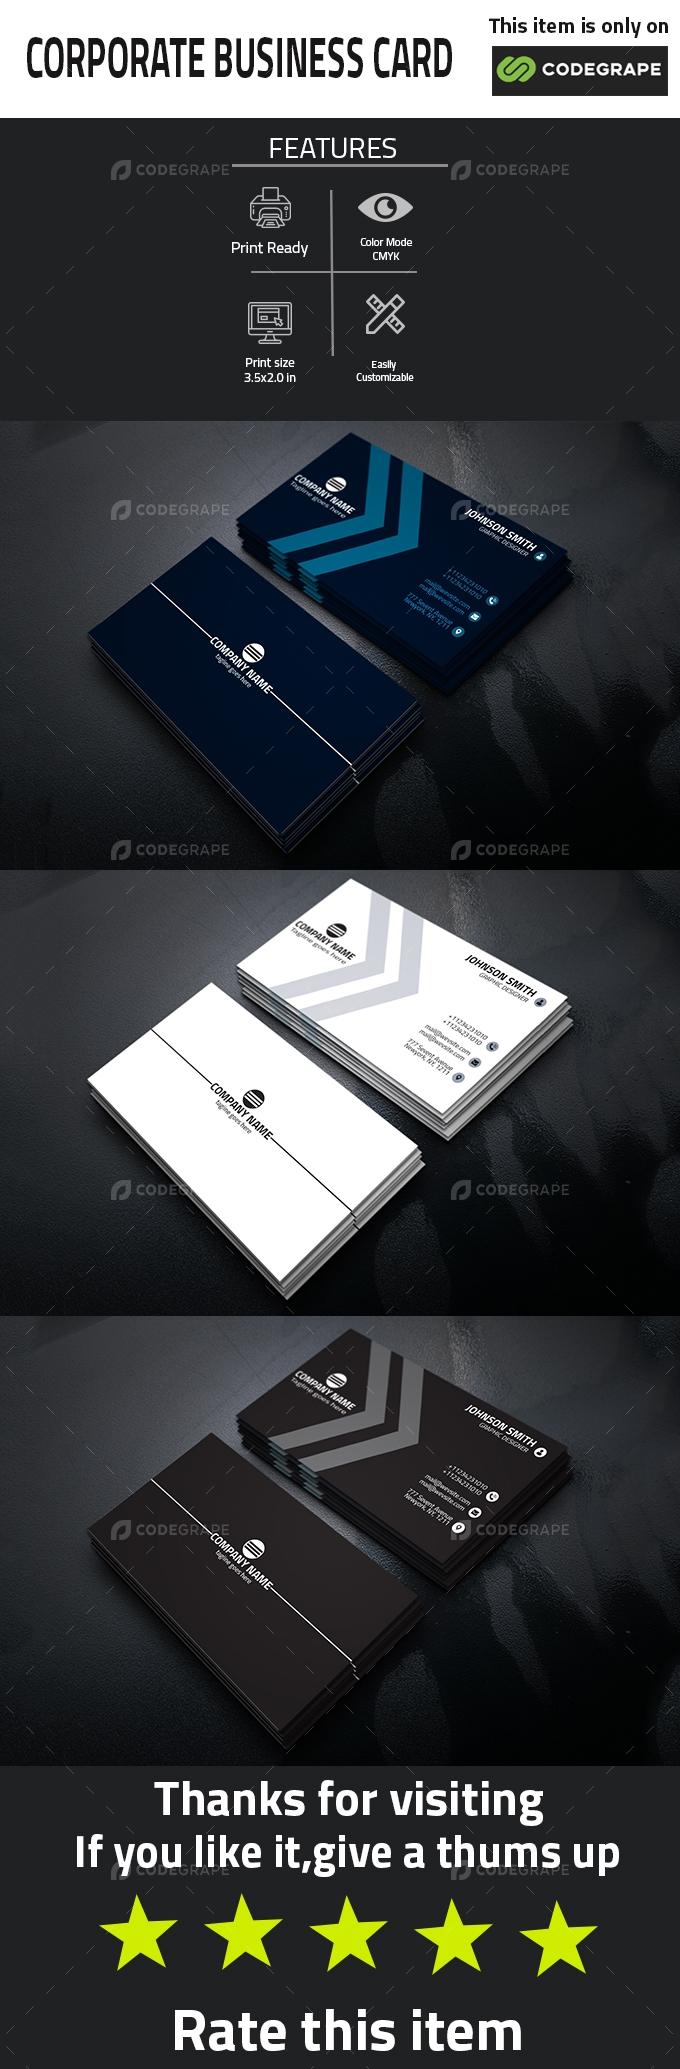 Corporate budiness card